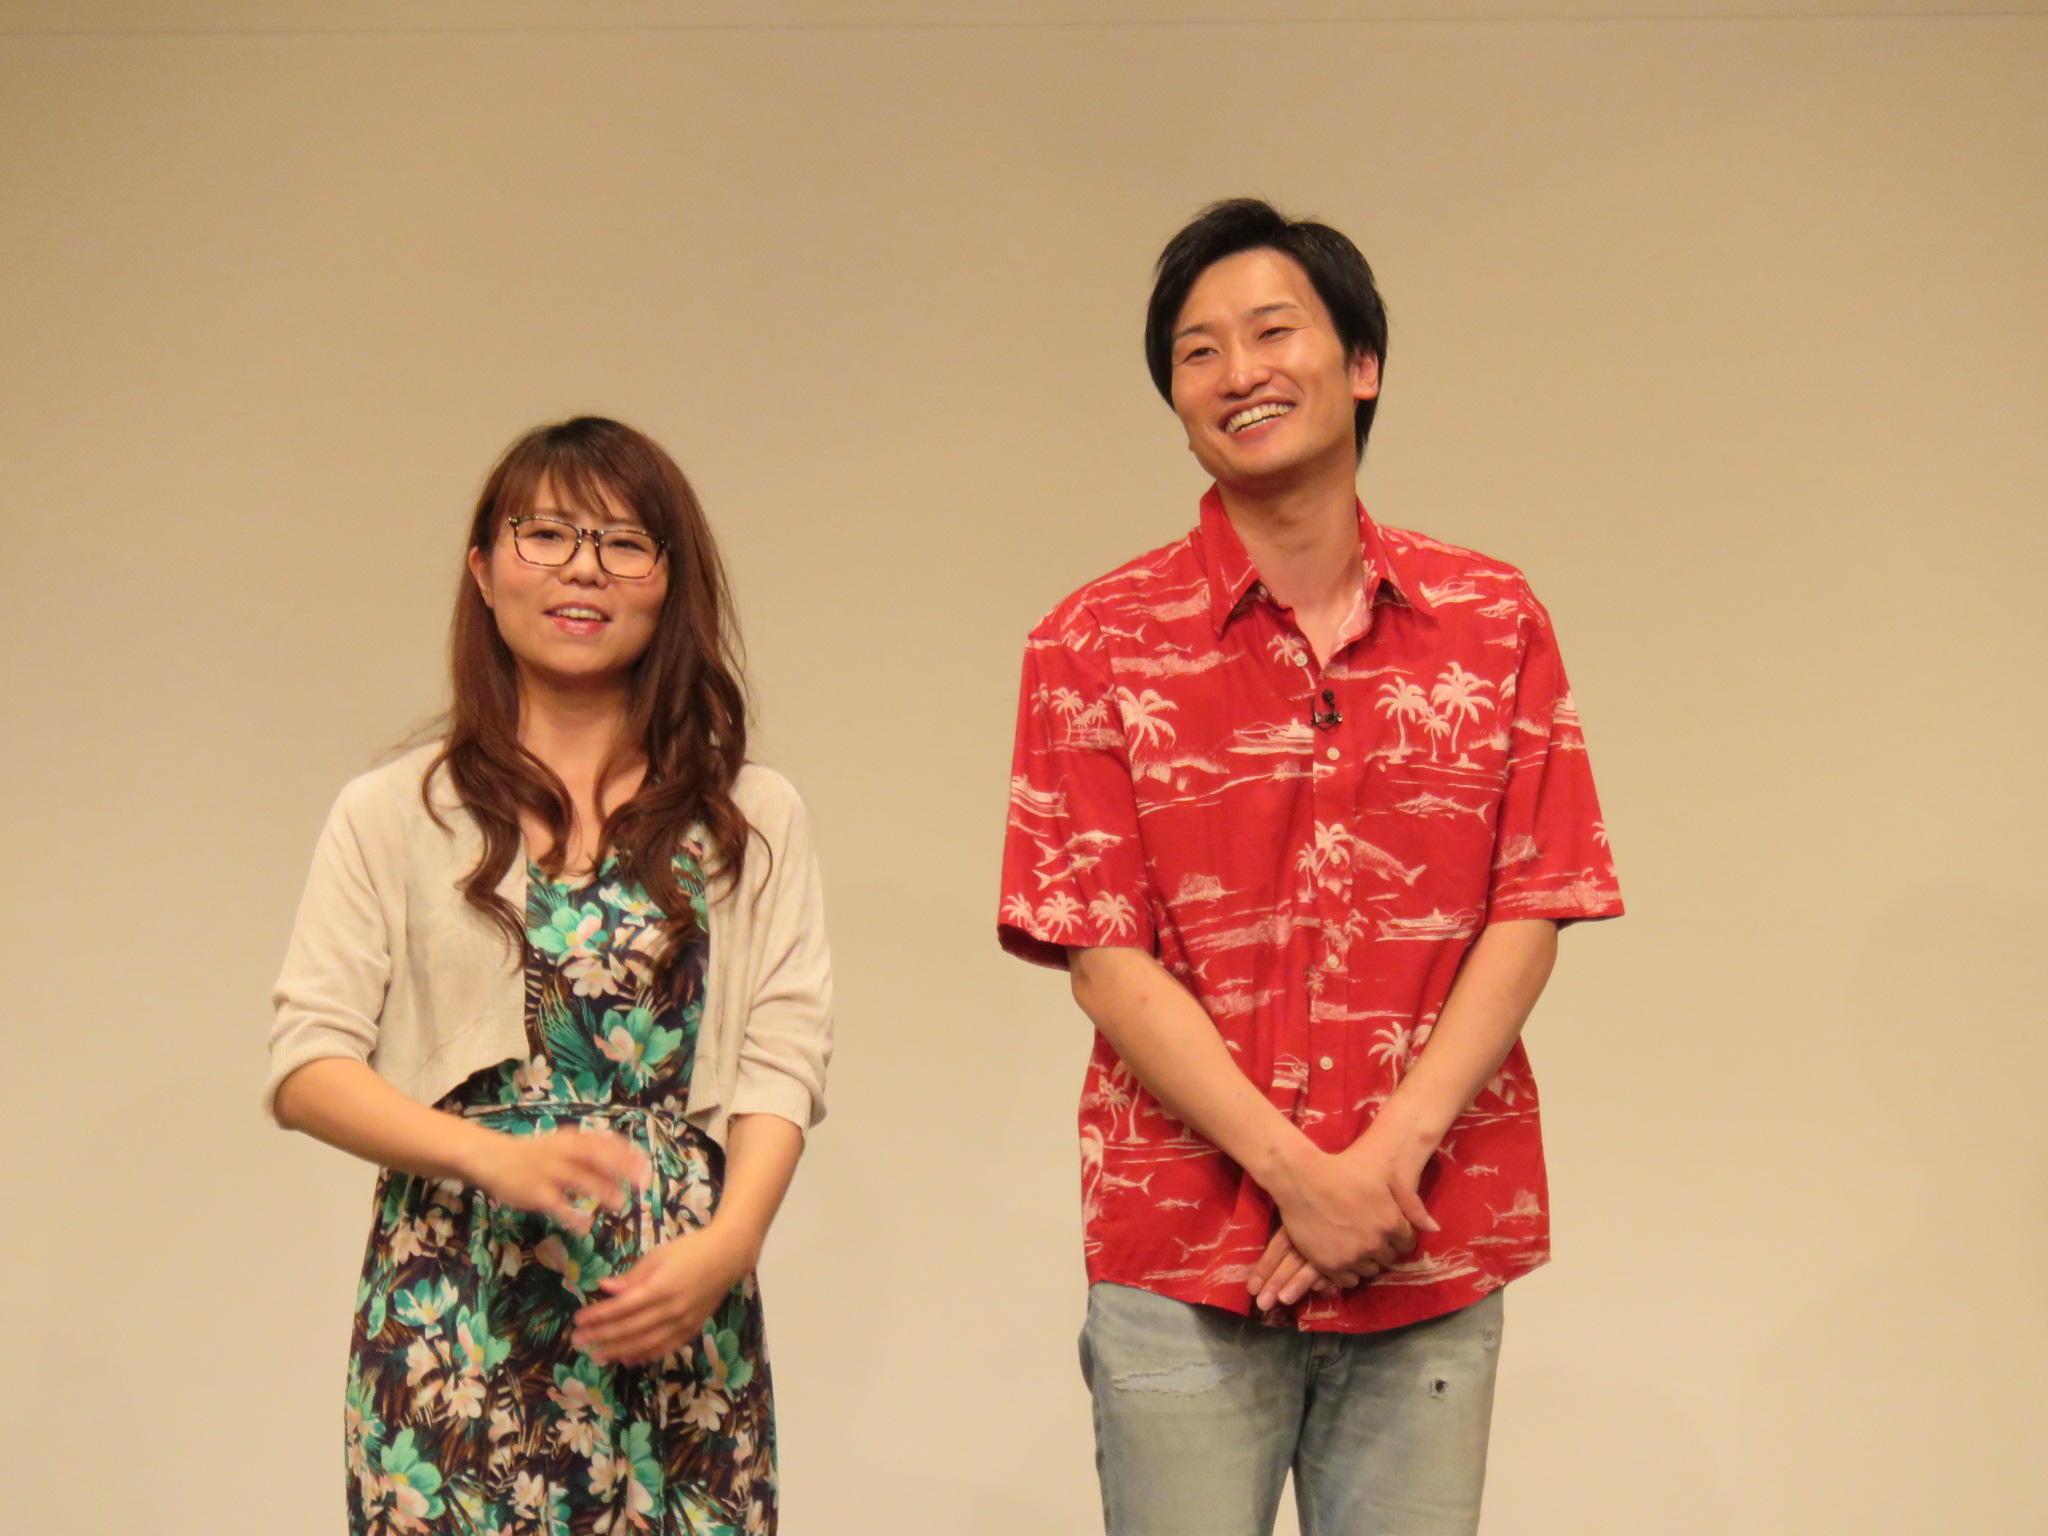 http://news.yoshimoto.co.jp/20170810215800-11a6498b4f38907026282c2be6e5f65324b46e8e.jpg